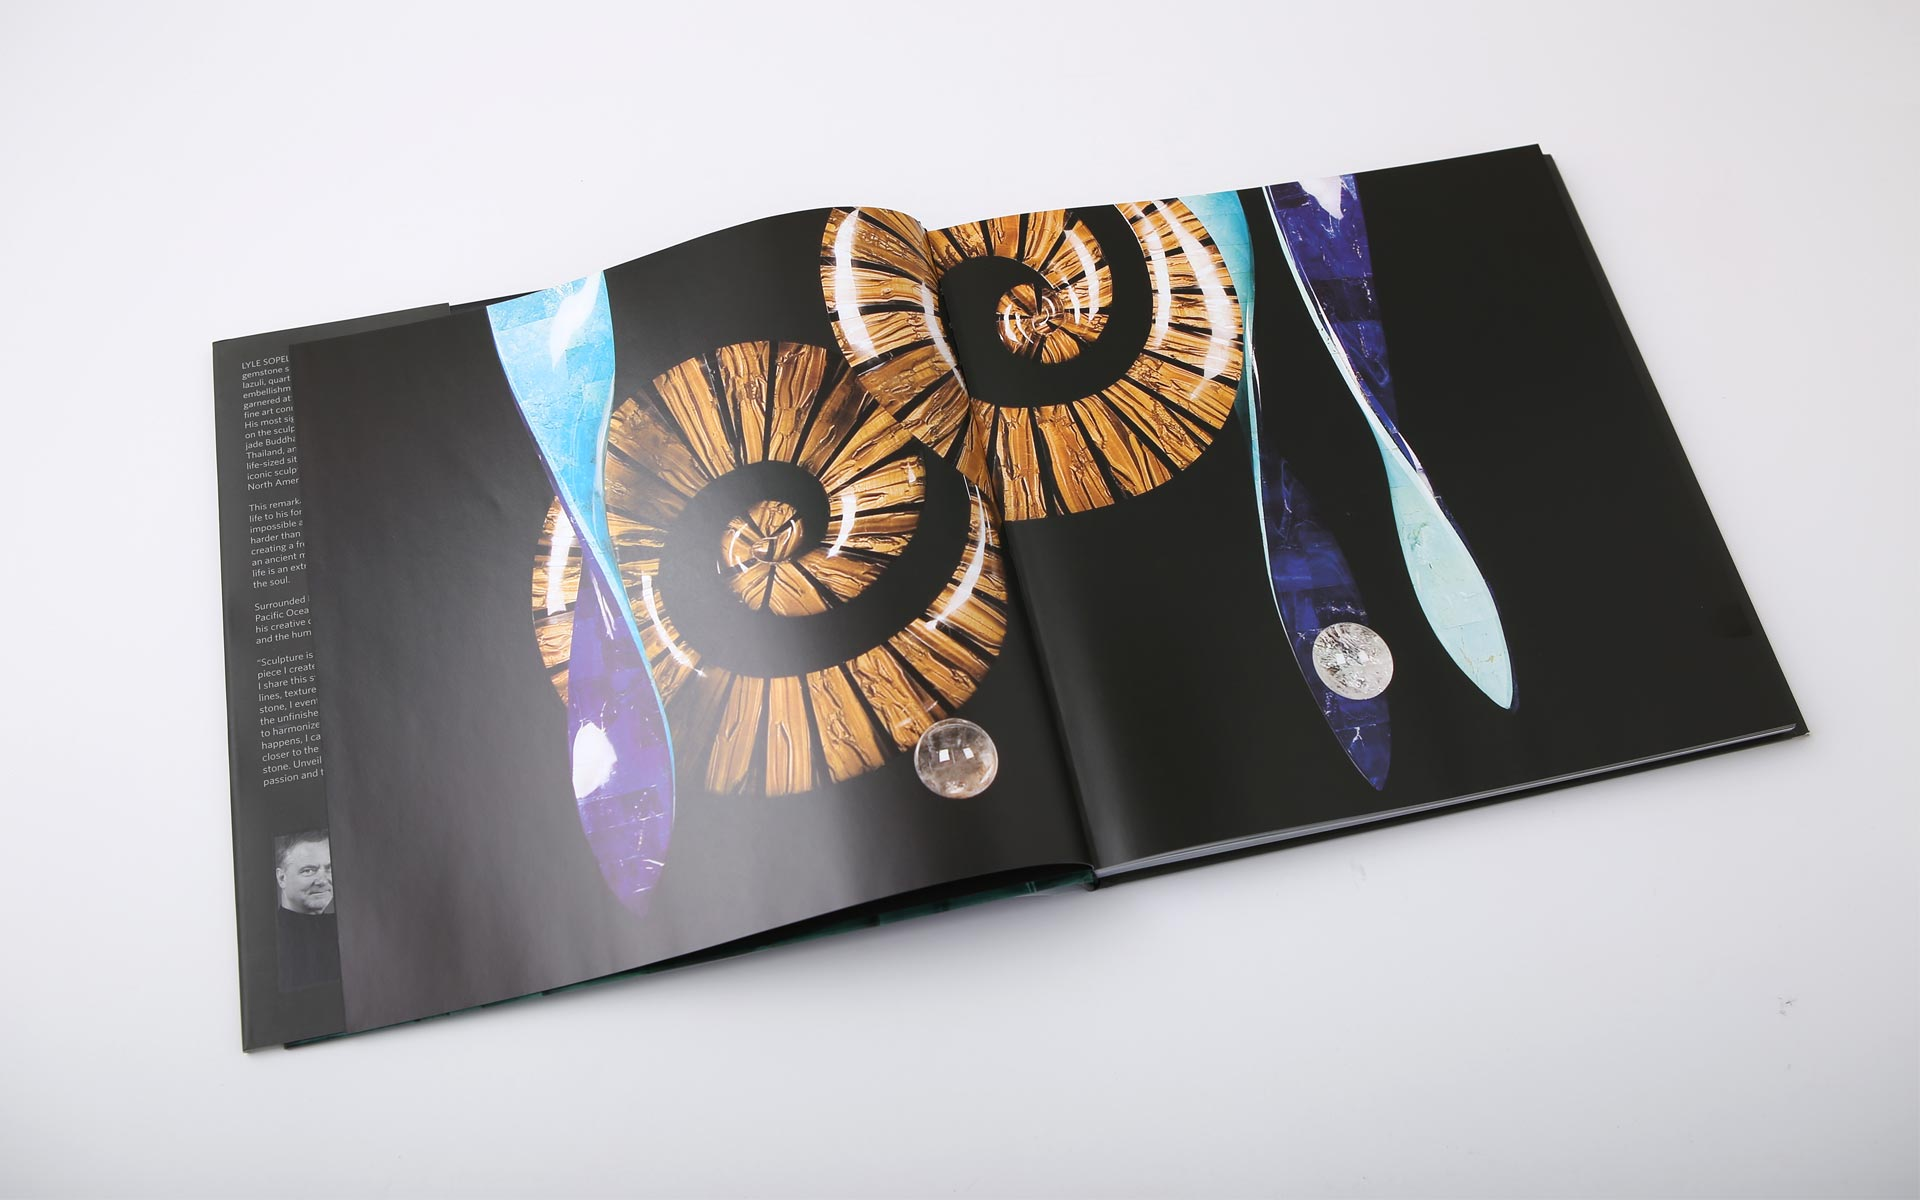 sopel-sculpture-book-design-6